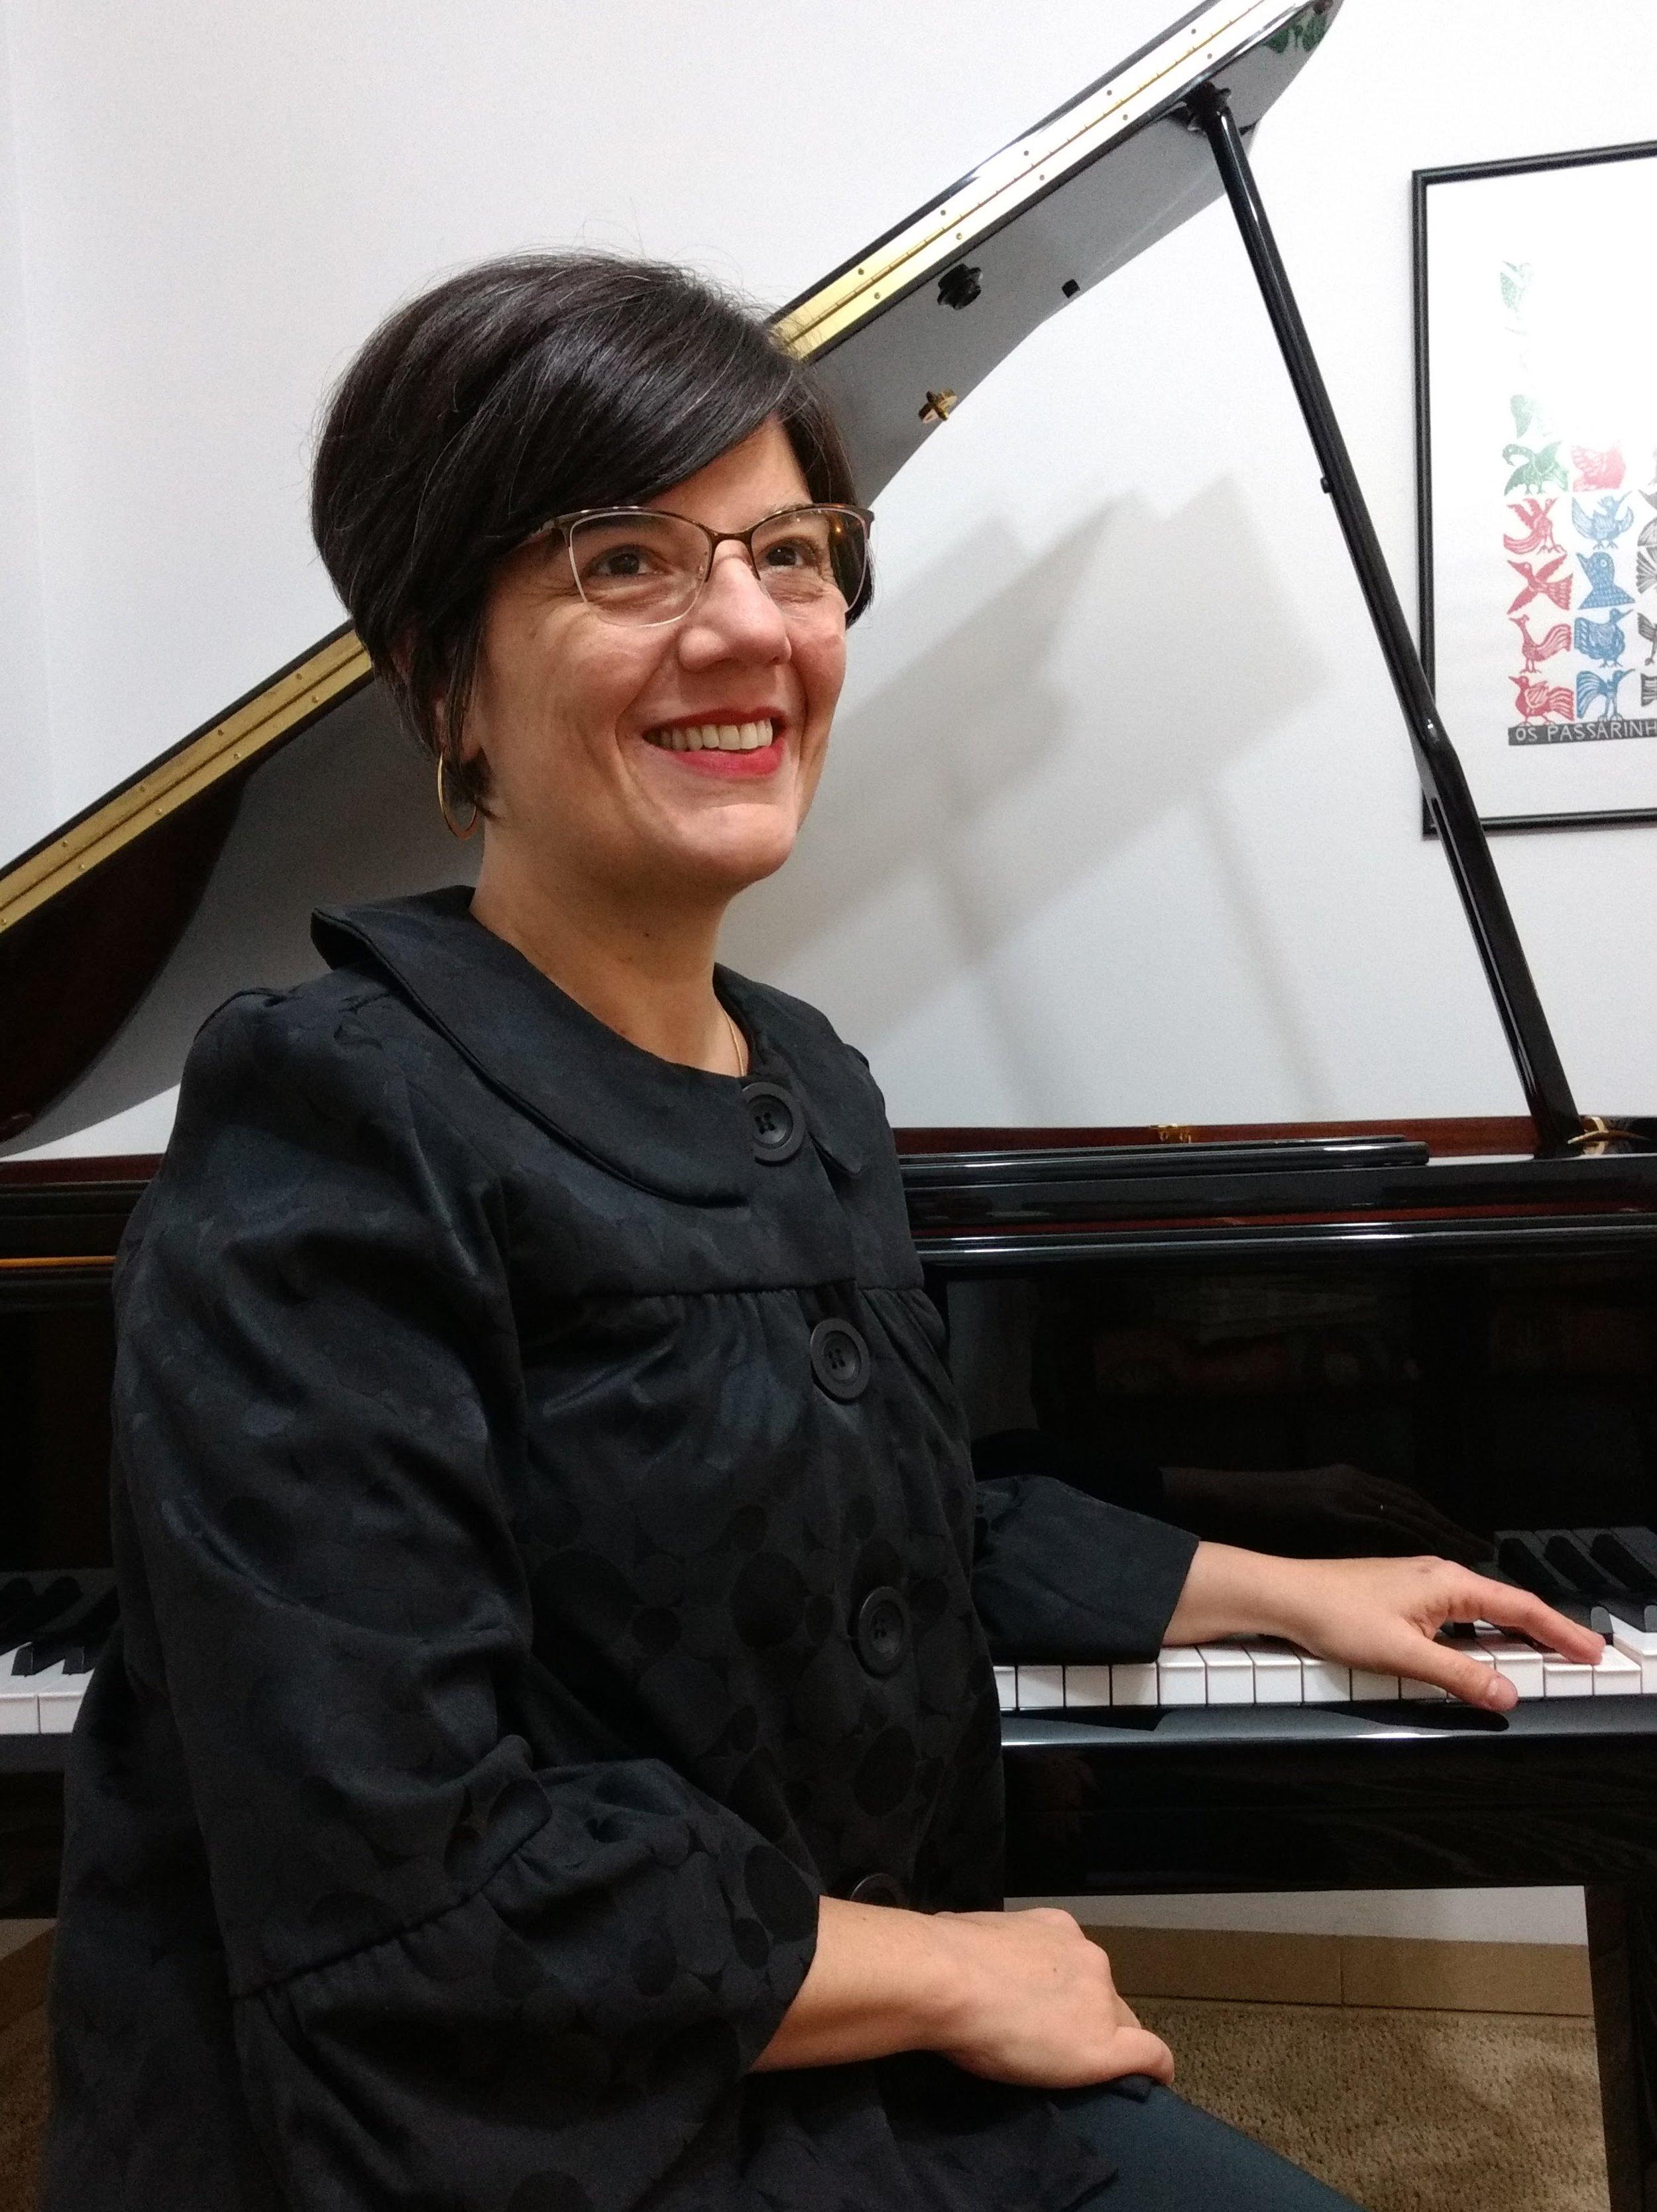 Ana Beatriz Marcondes Marra é Bacharel